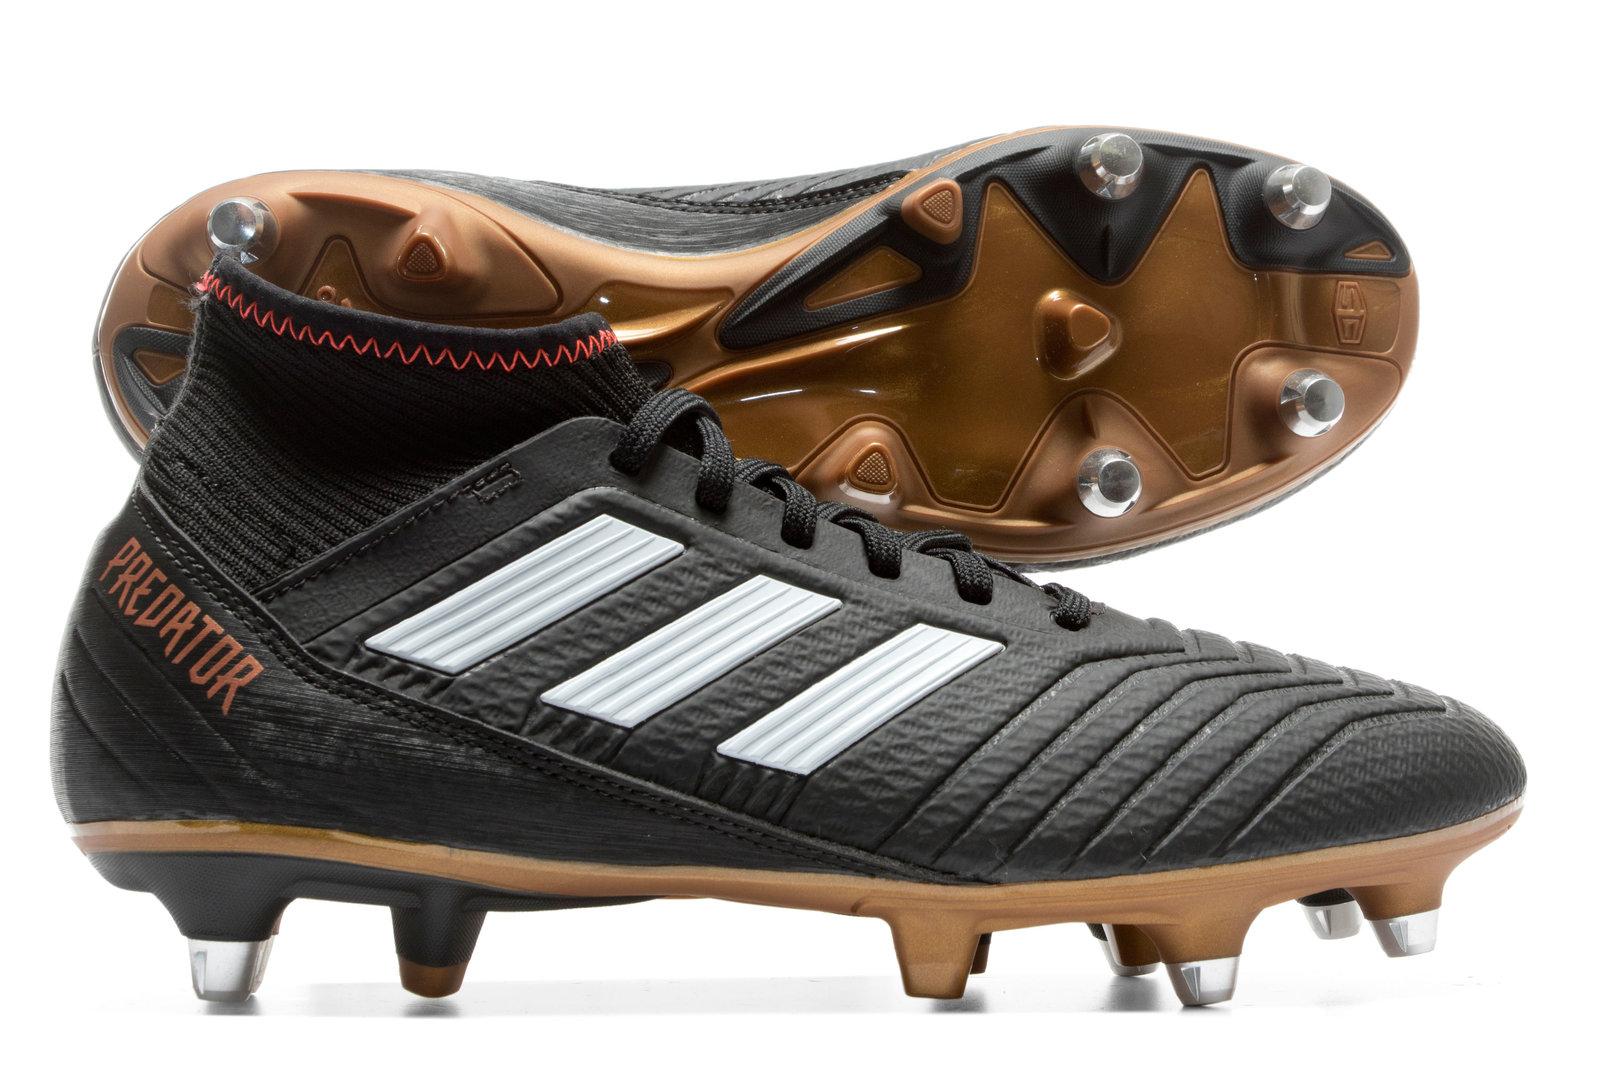 c7821bdd17a adidas Mens Predator 18.3 SG Football Boots Studs Trainers Sports Shoes  Black